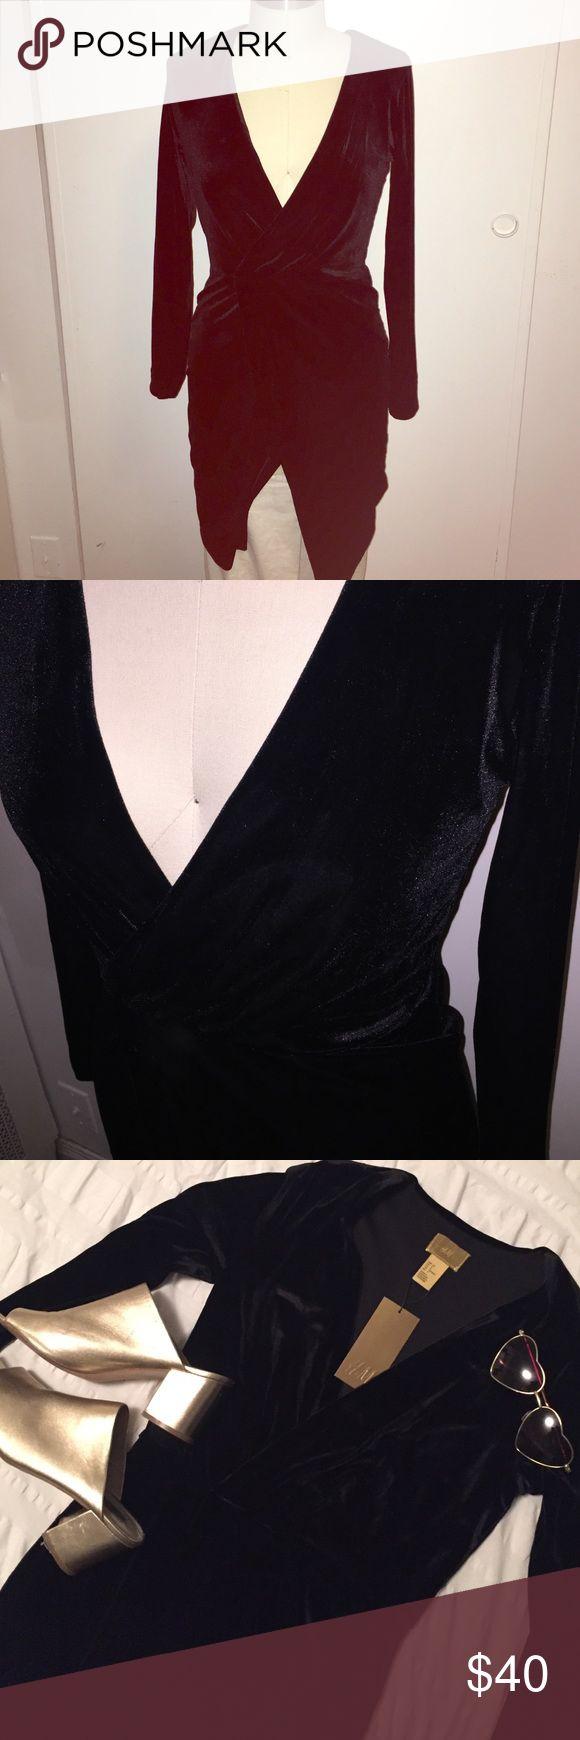 H&M velvet dress Perfect winter dress! Deep v-neck surplice dress with long sleeve. Stretchy and comfy H&M Dresses Mini